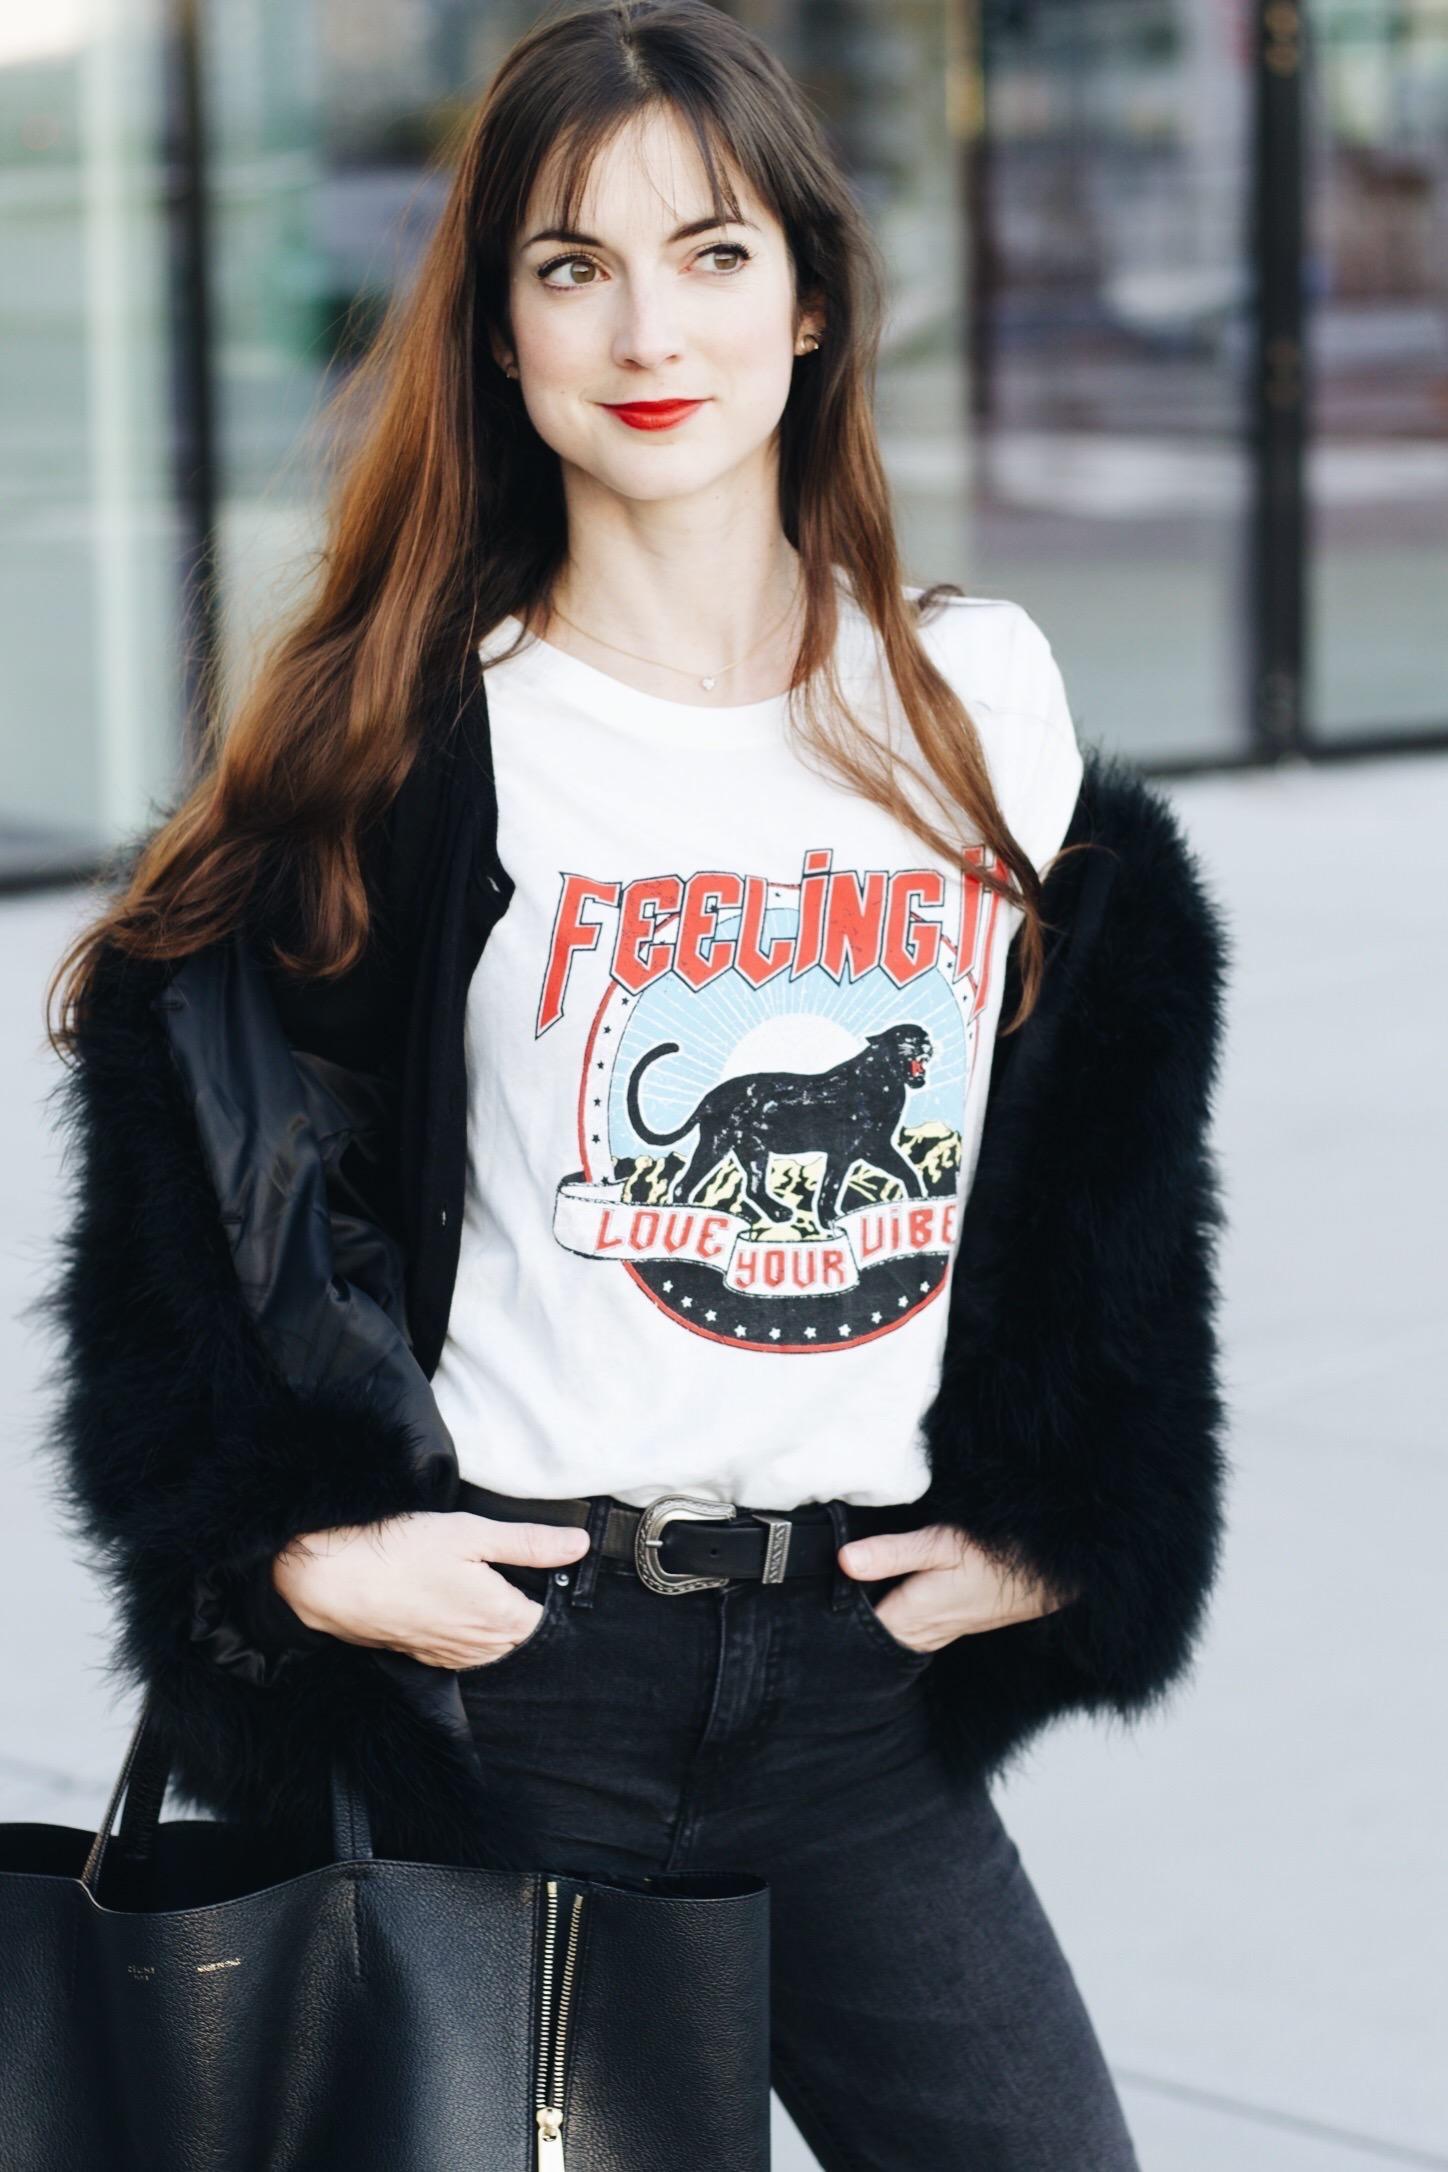 Felljacke Federjacke und Kick Flare Jeans auf meinem Modeblog